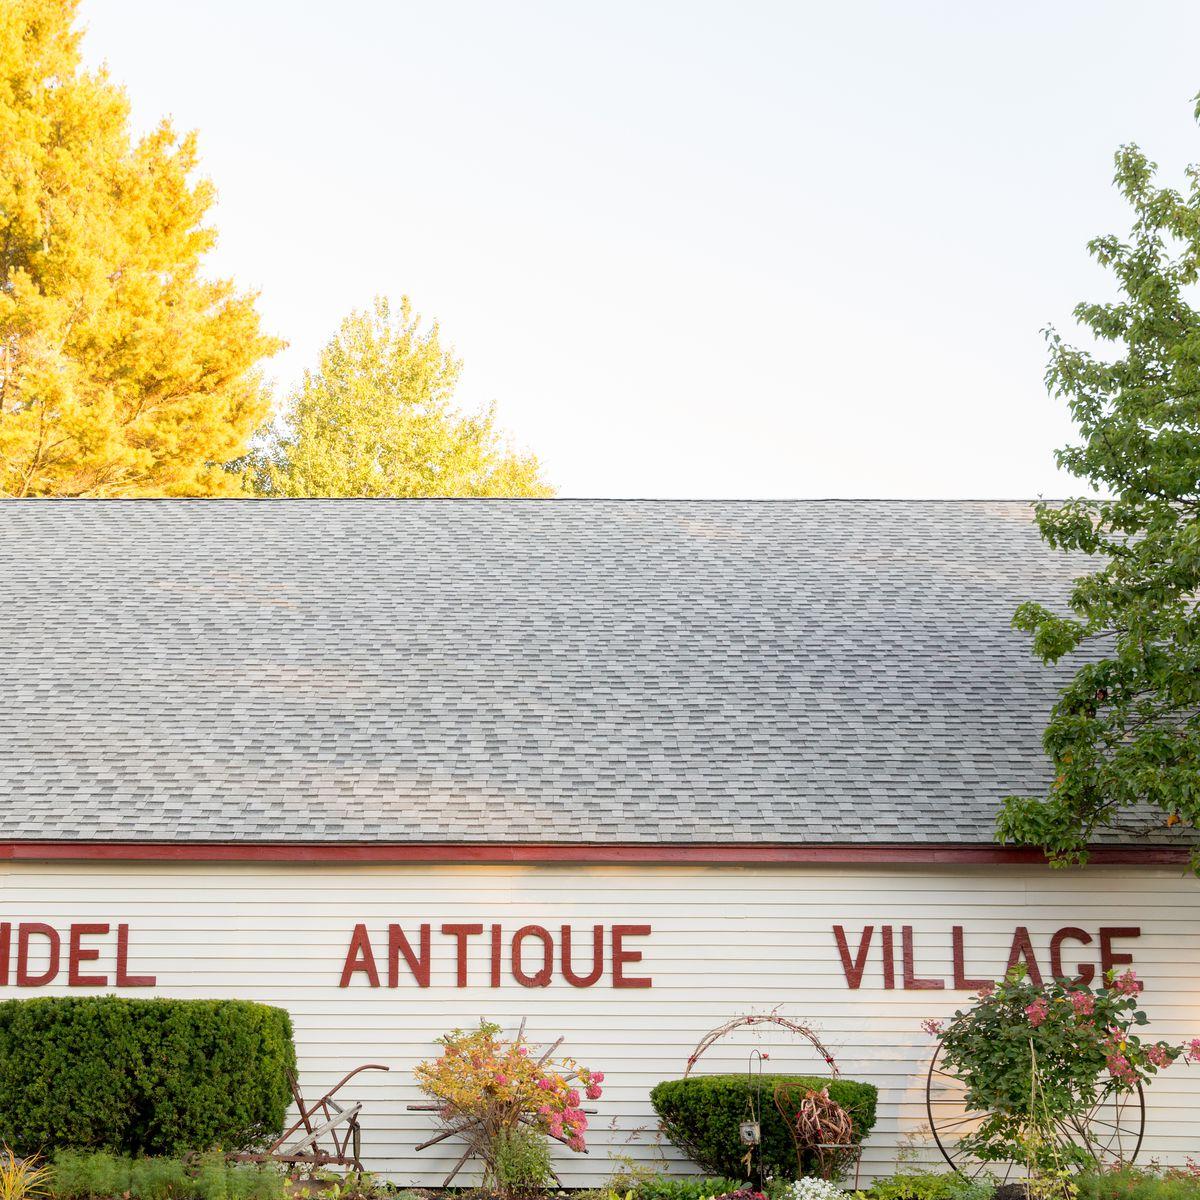 Arundel Antique Village